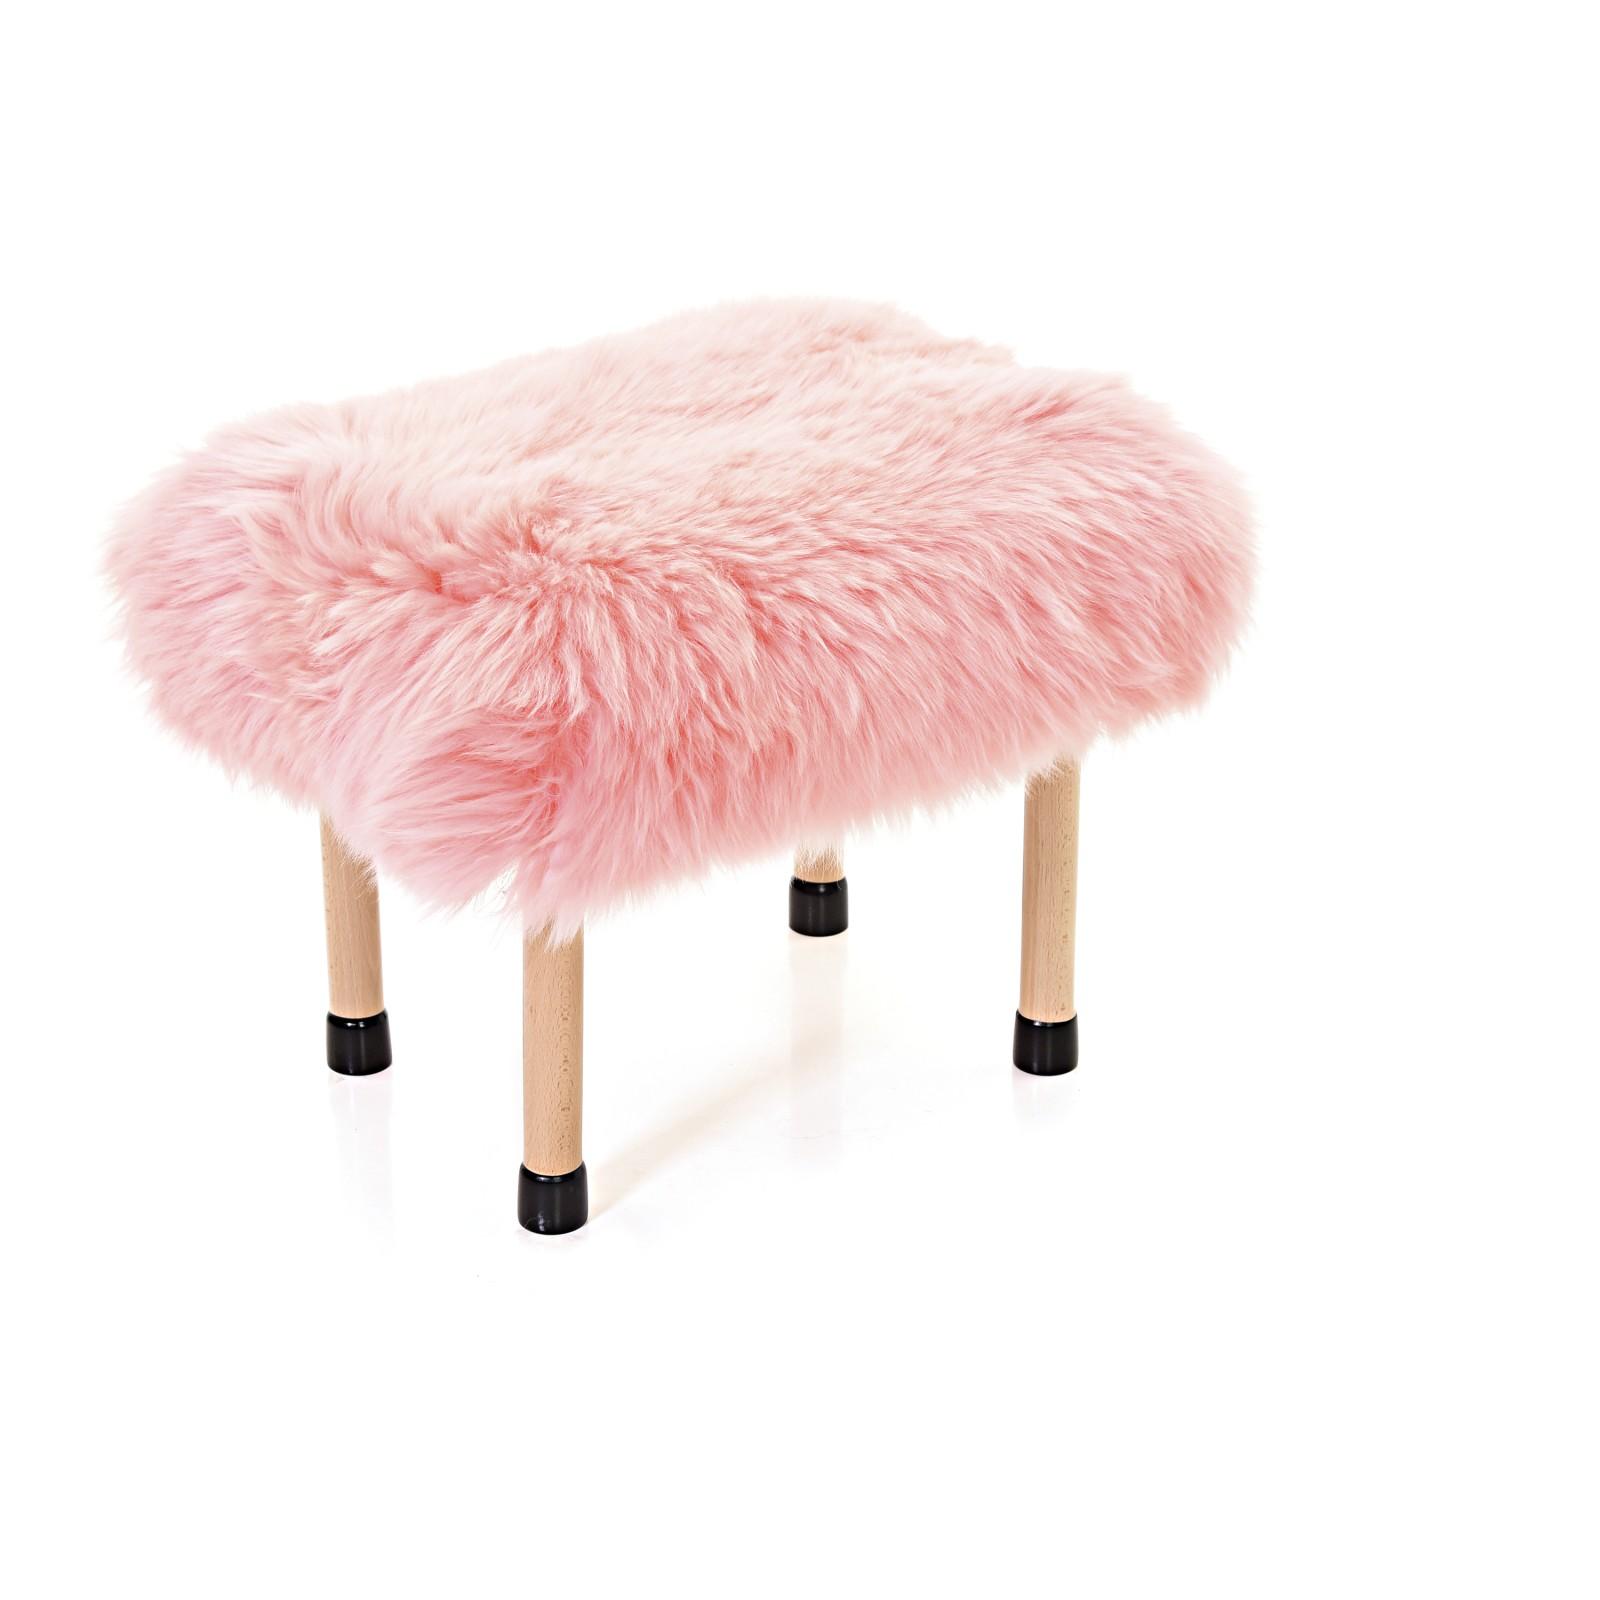 Nerys Sheepskin Footstool Baby Pink